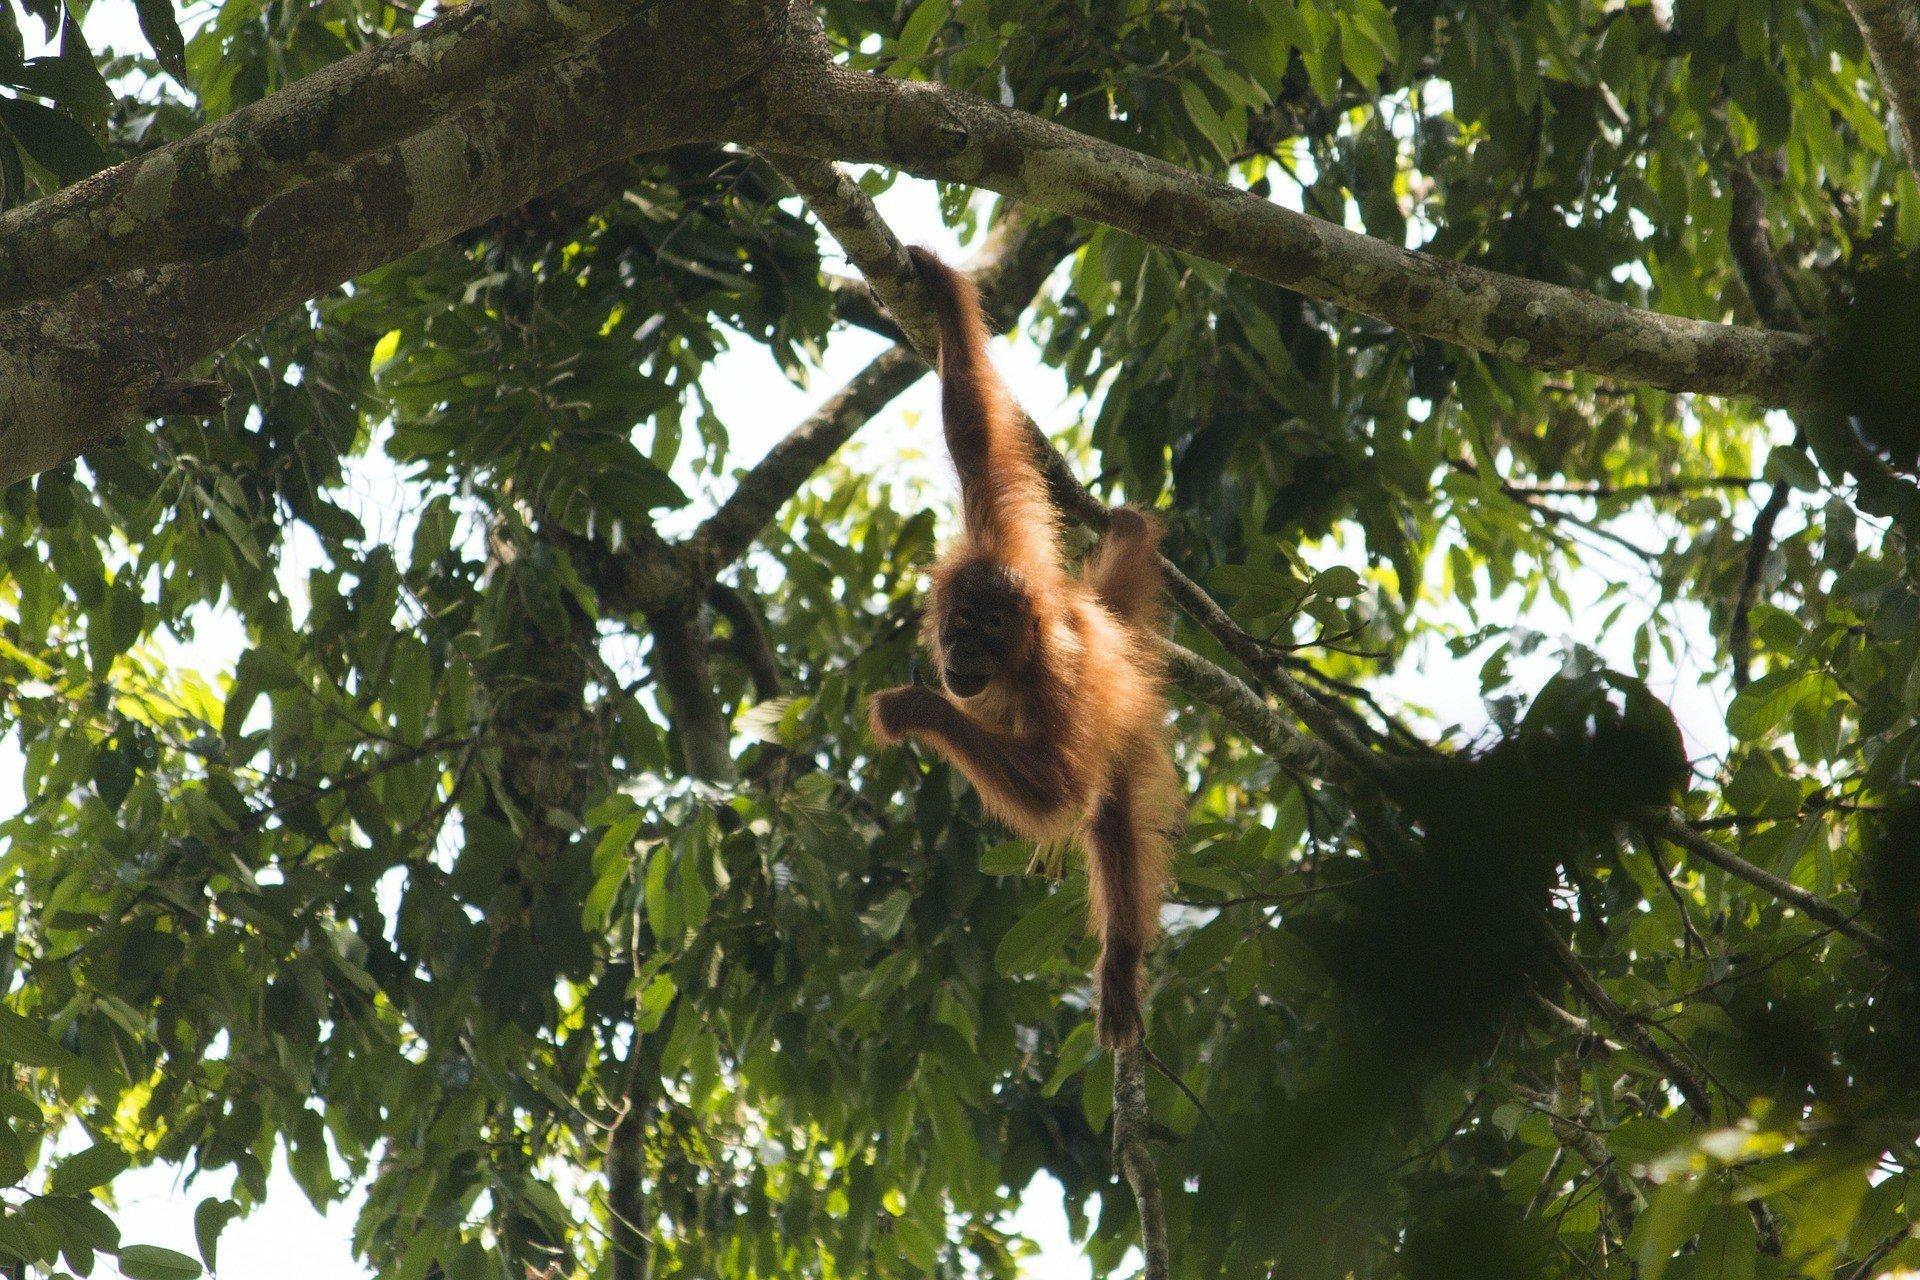 Orangutan in a forest eco-sanctuary in Malaysia